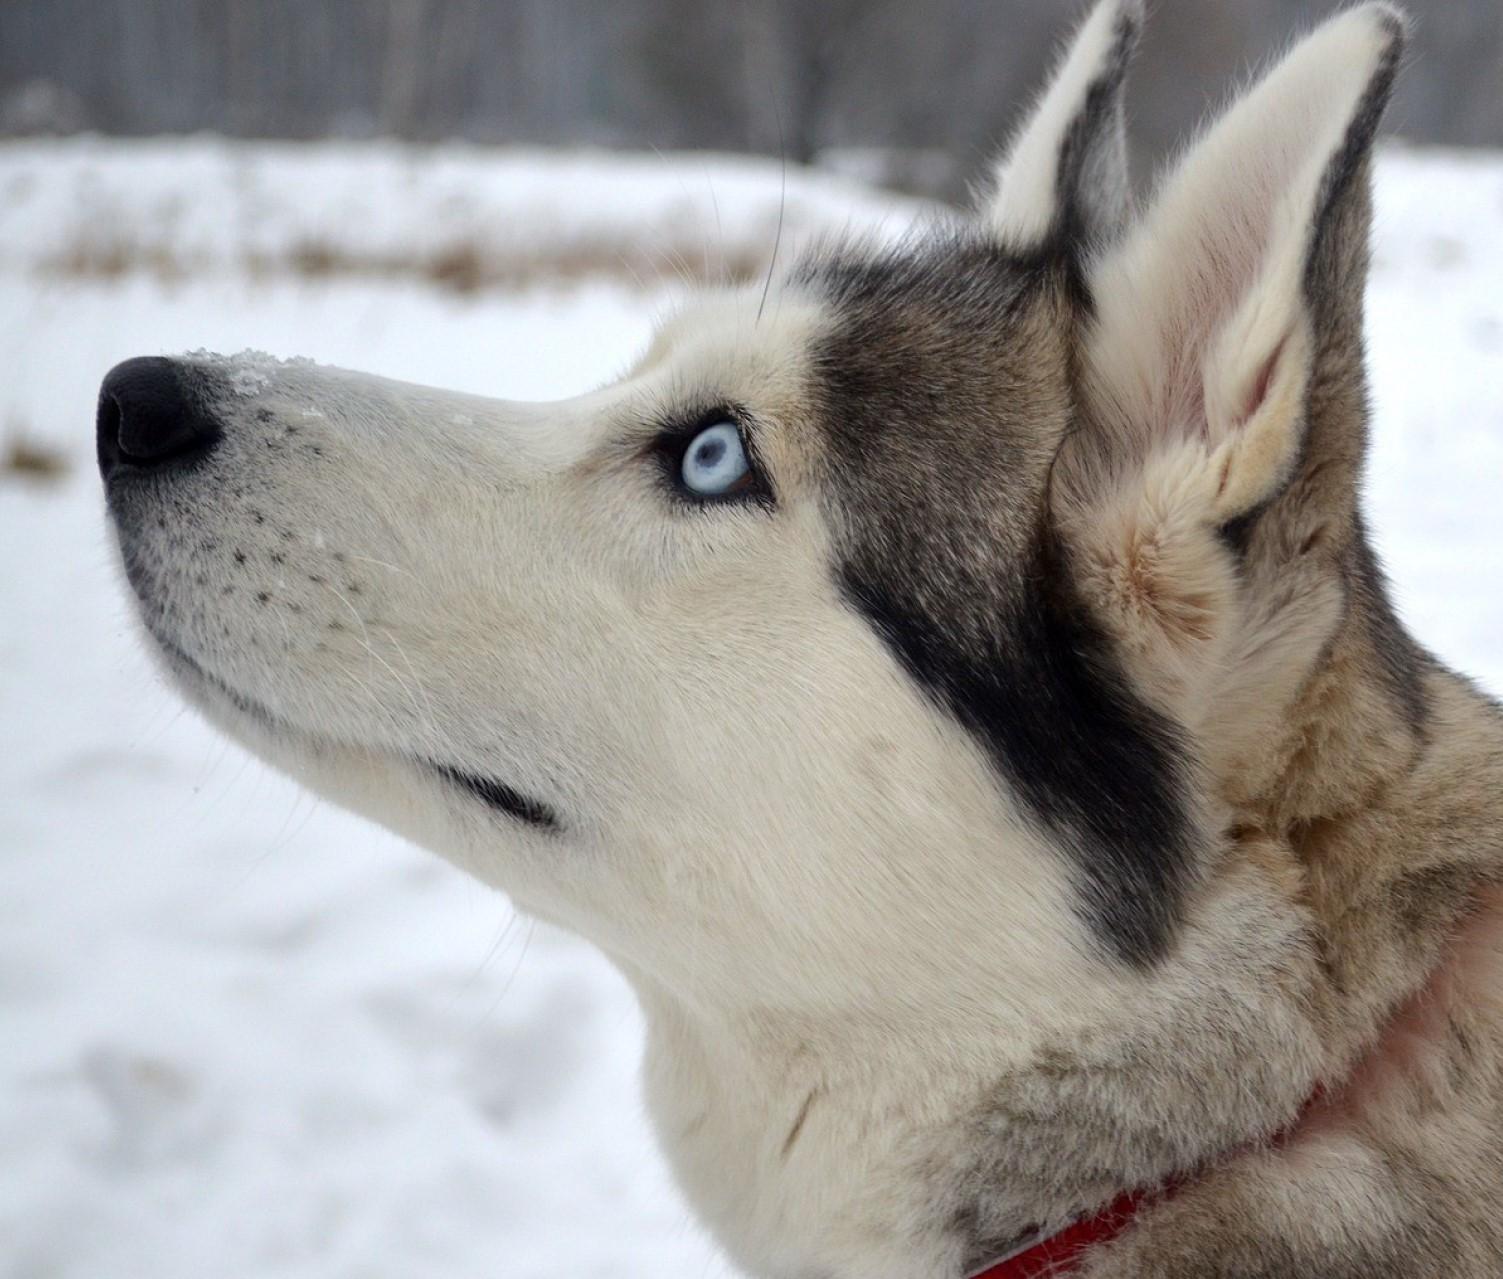 A husky dog with sky-blue eyes in winter